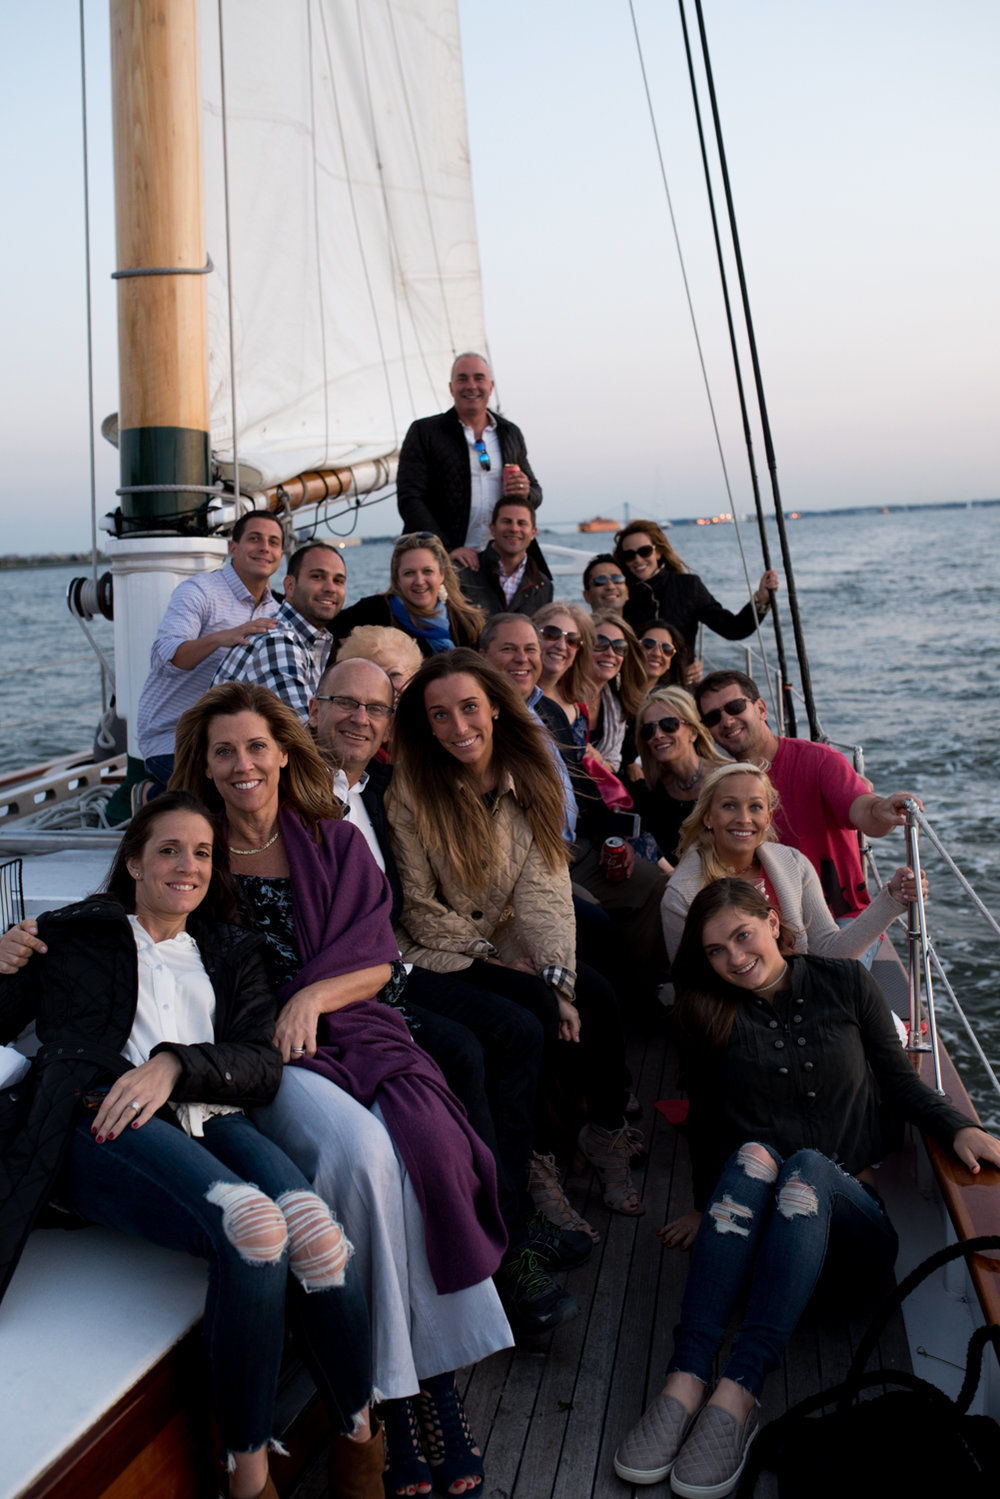 Mike's 50th Birthday- Adirondack Cruise on Hudson River- New York City- Olivia Christina Photo-140.JPG